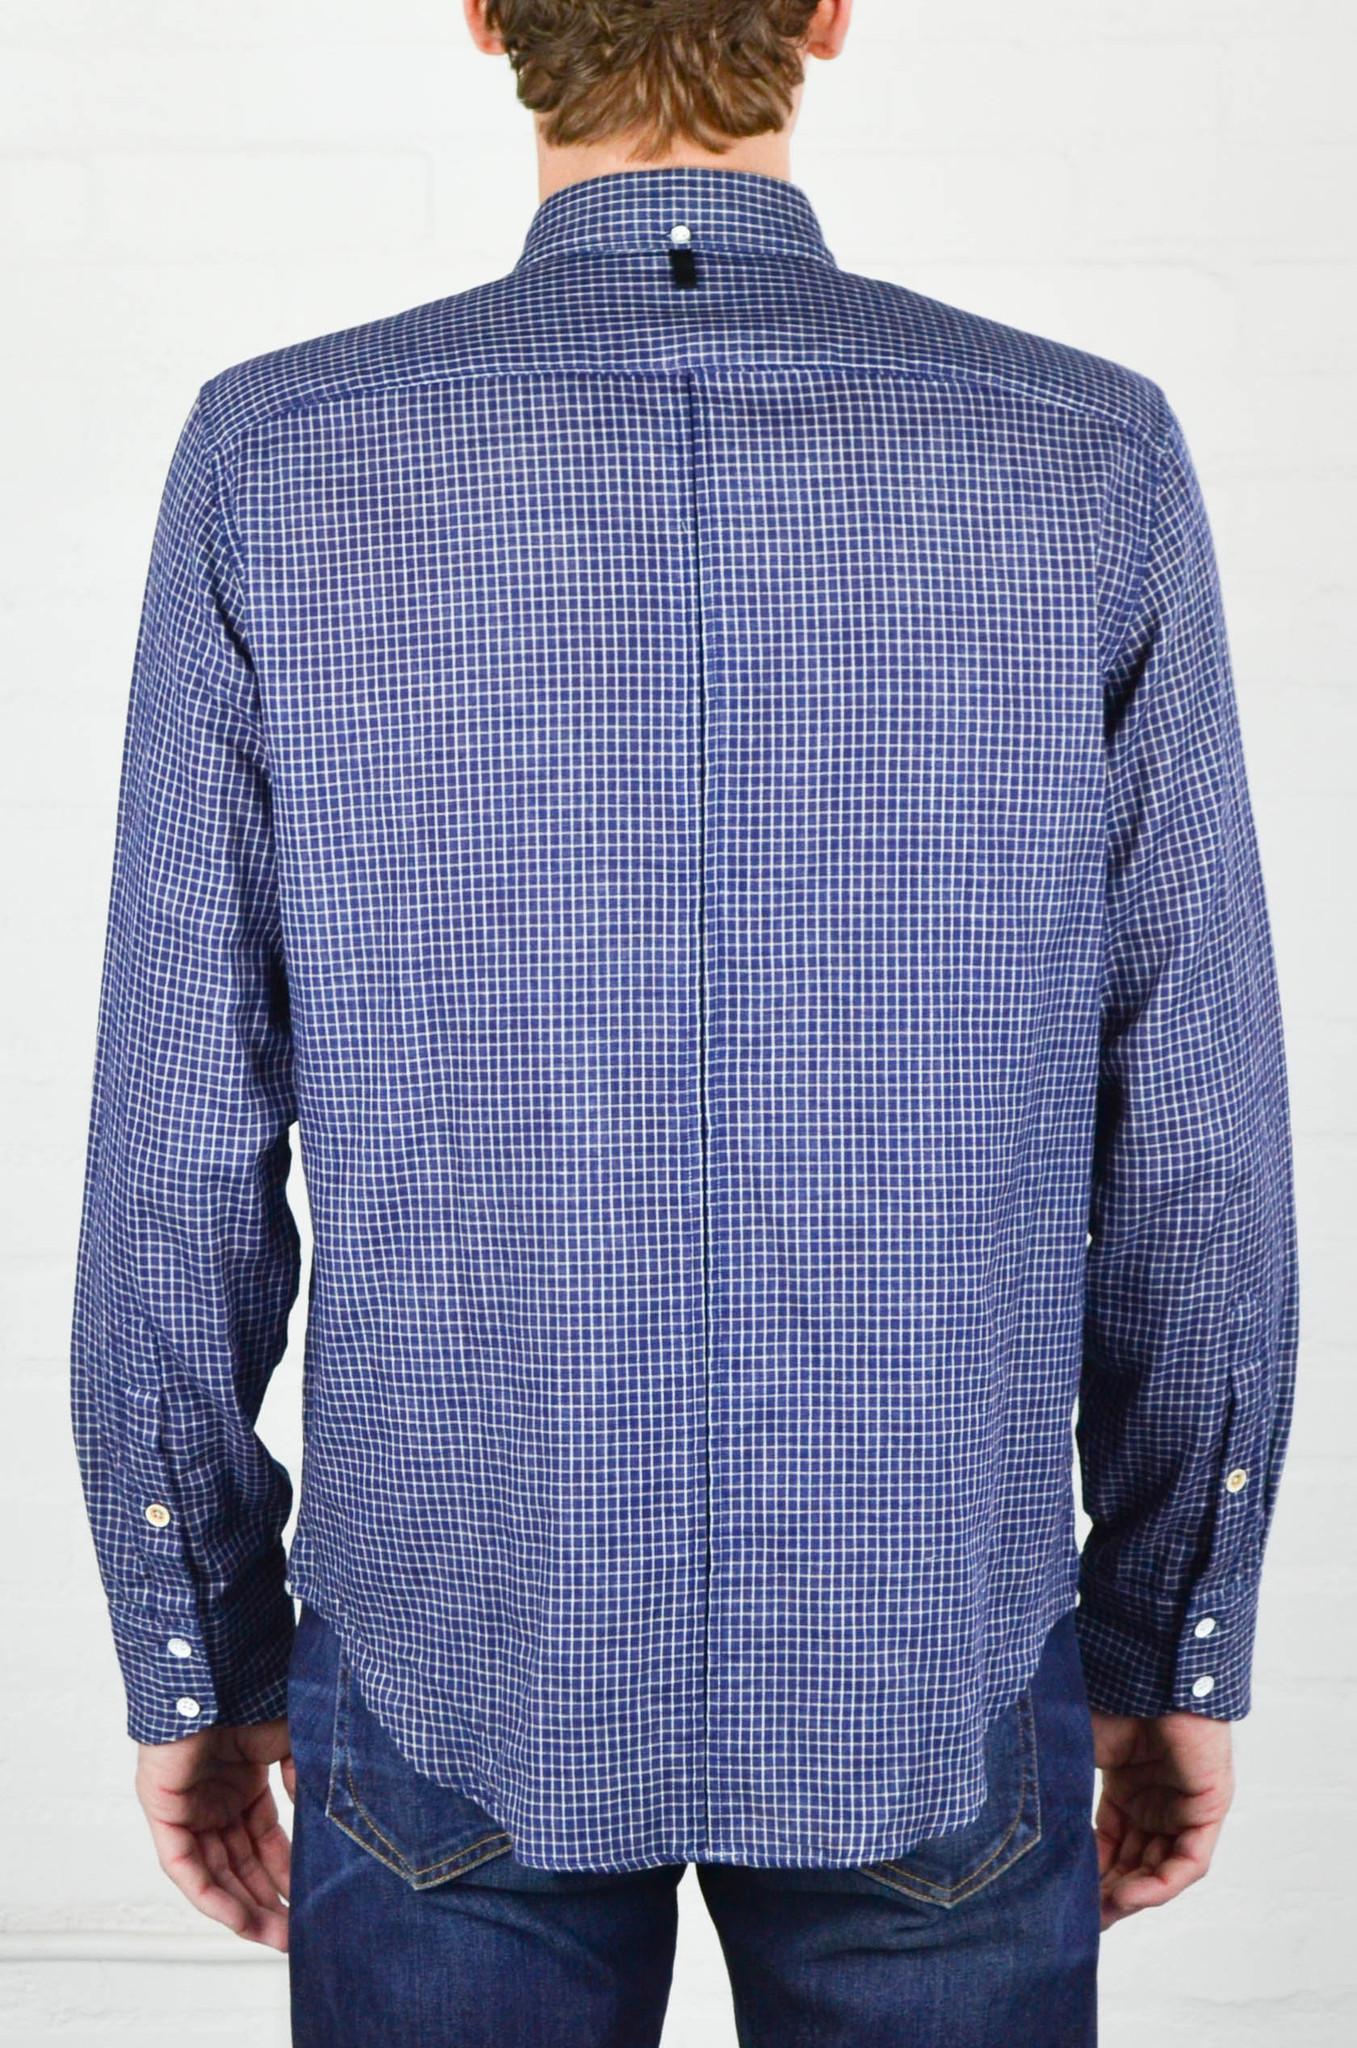 Men 39 s rag and bone indigo check yokohama shirt garmentory for Rag and bone mens shirts sale